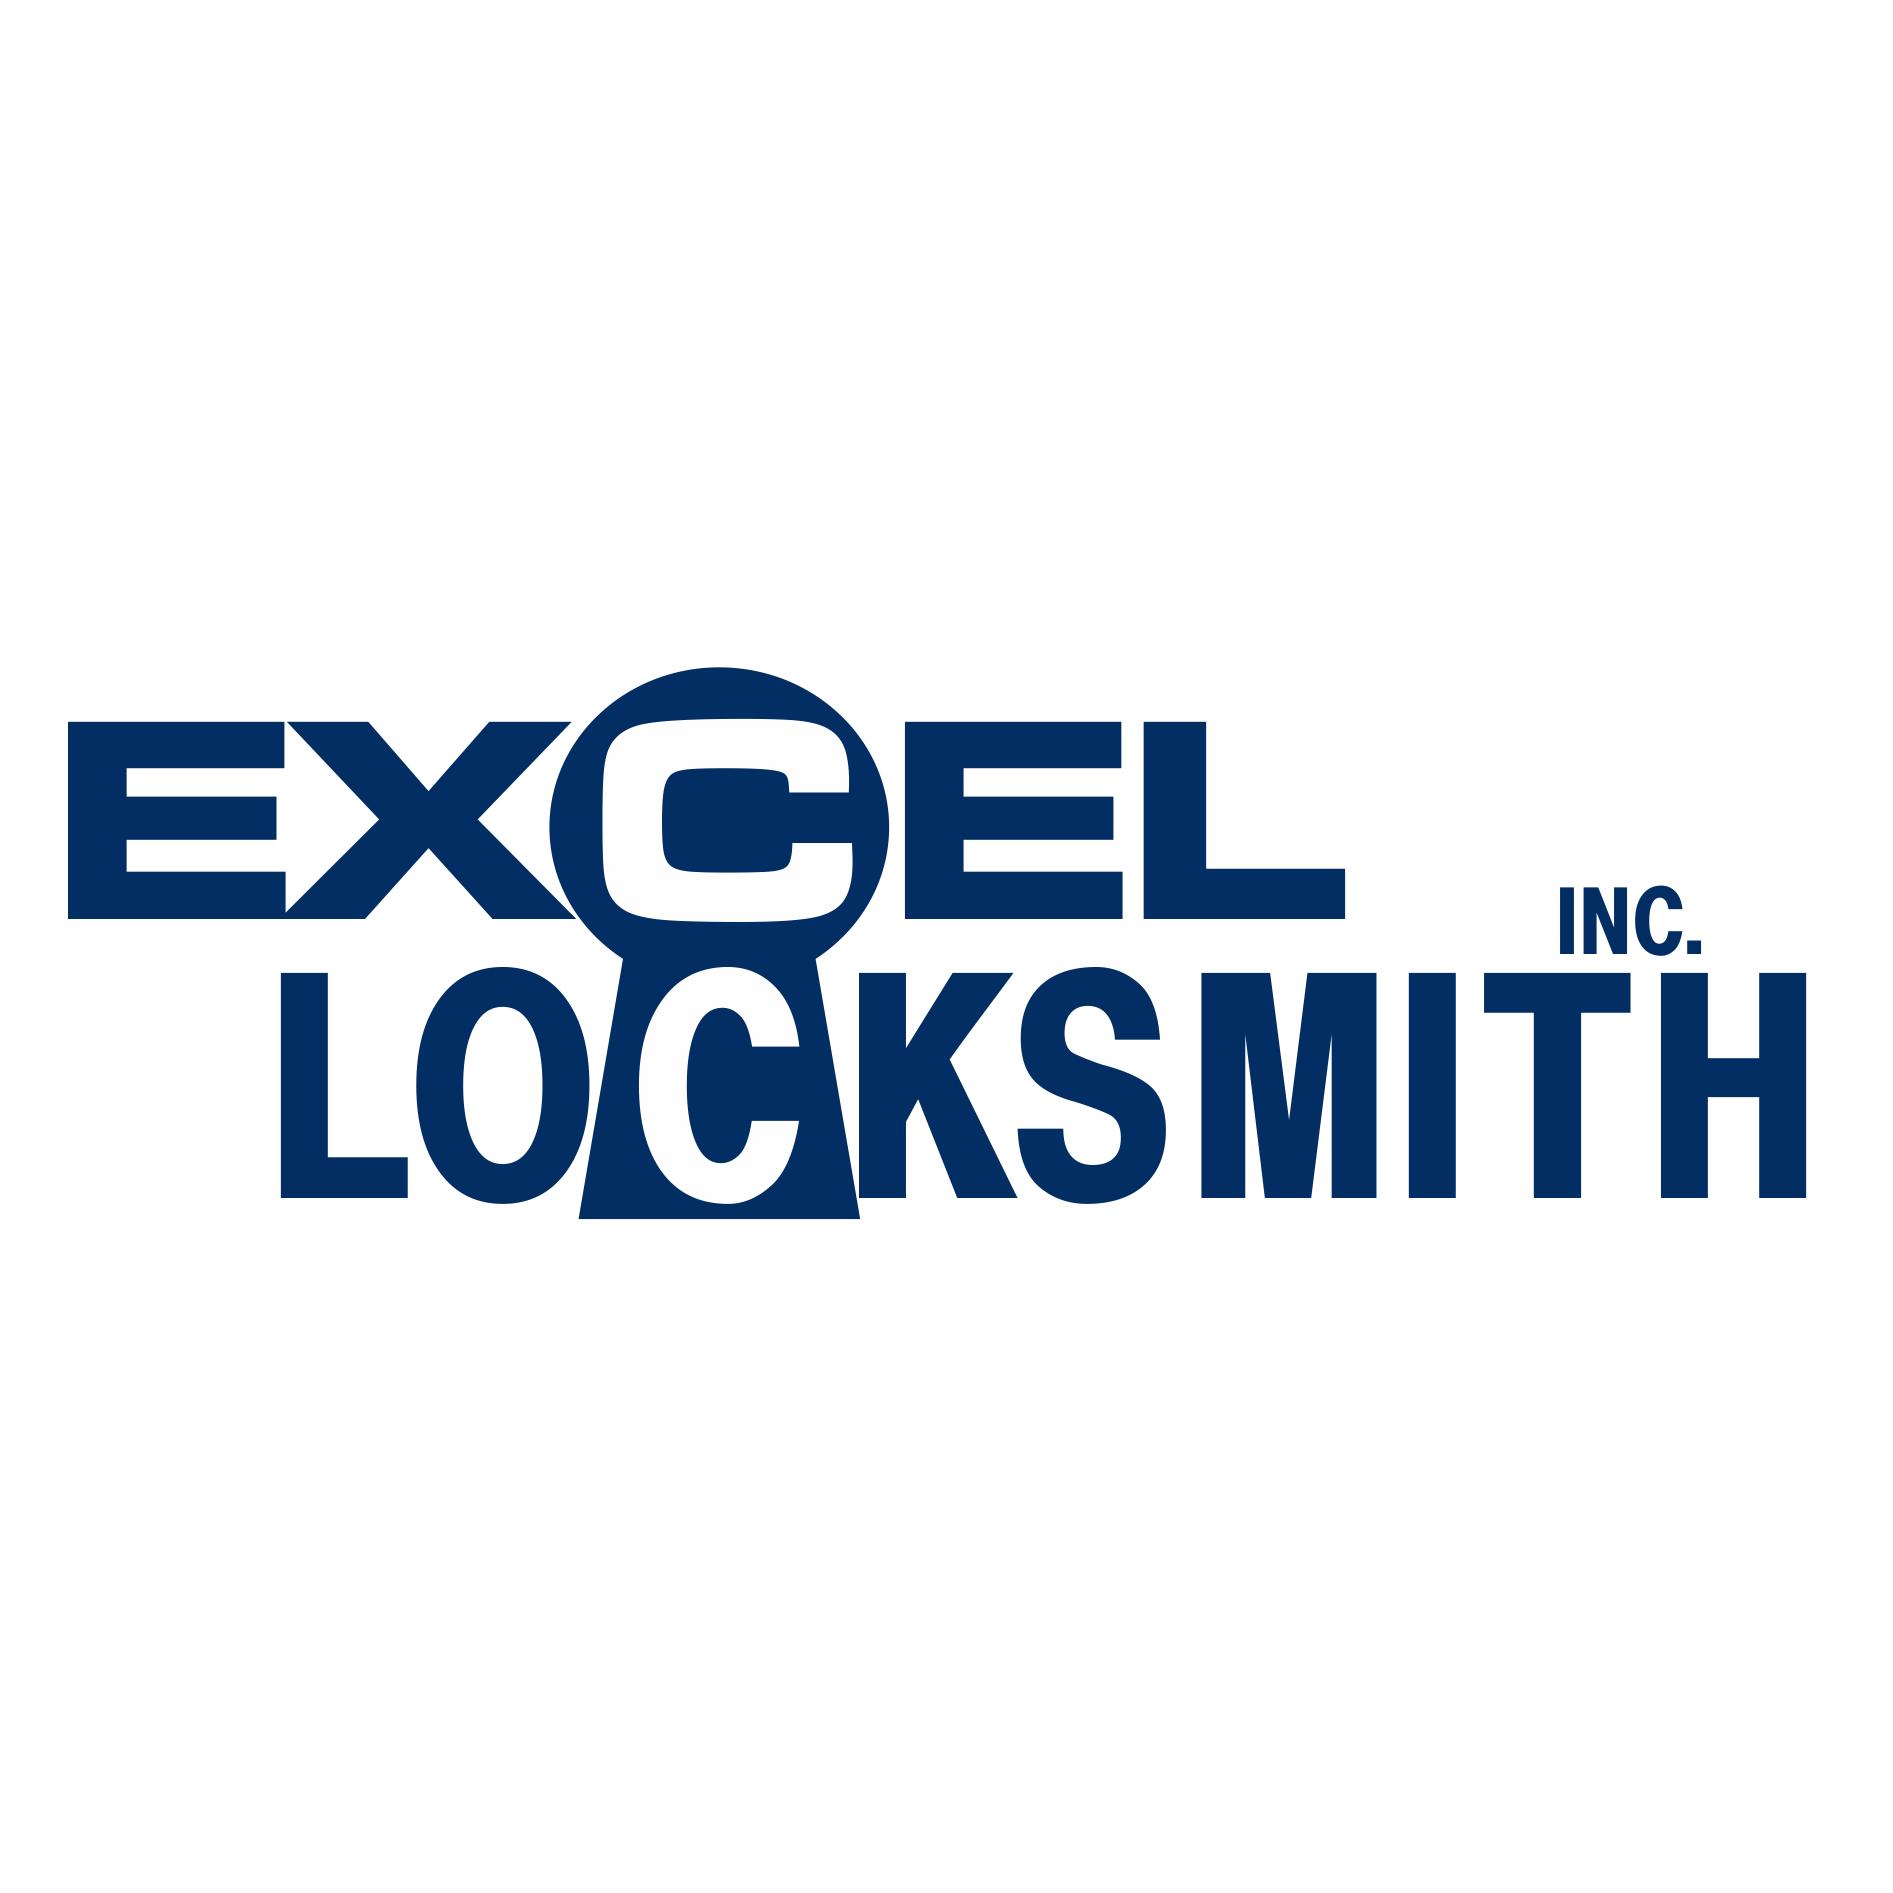 Excel Locksmith